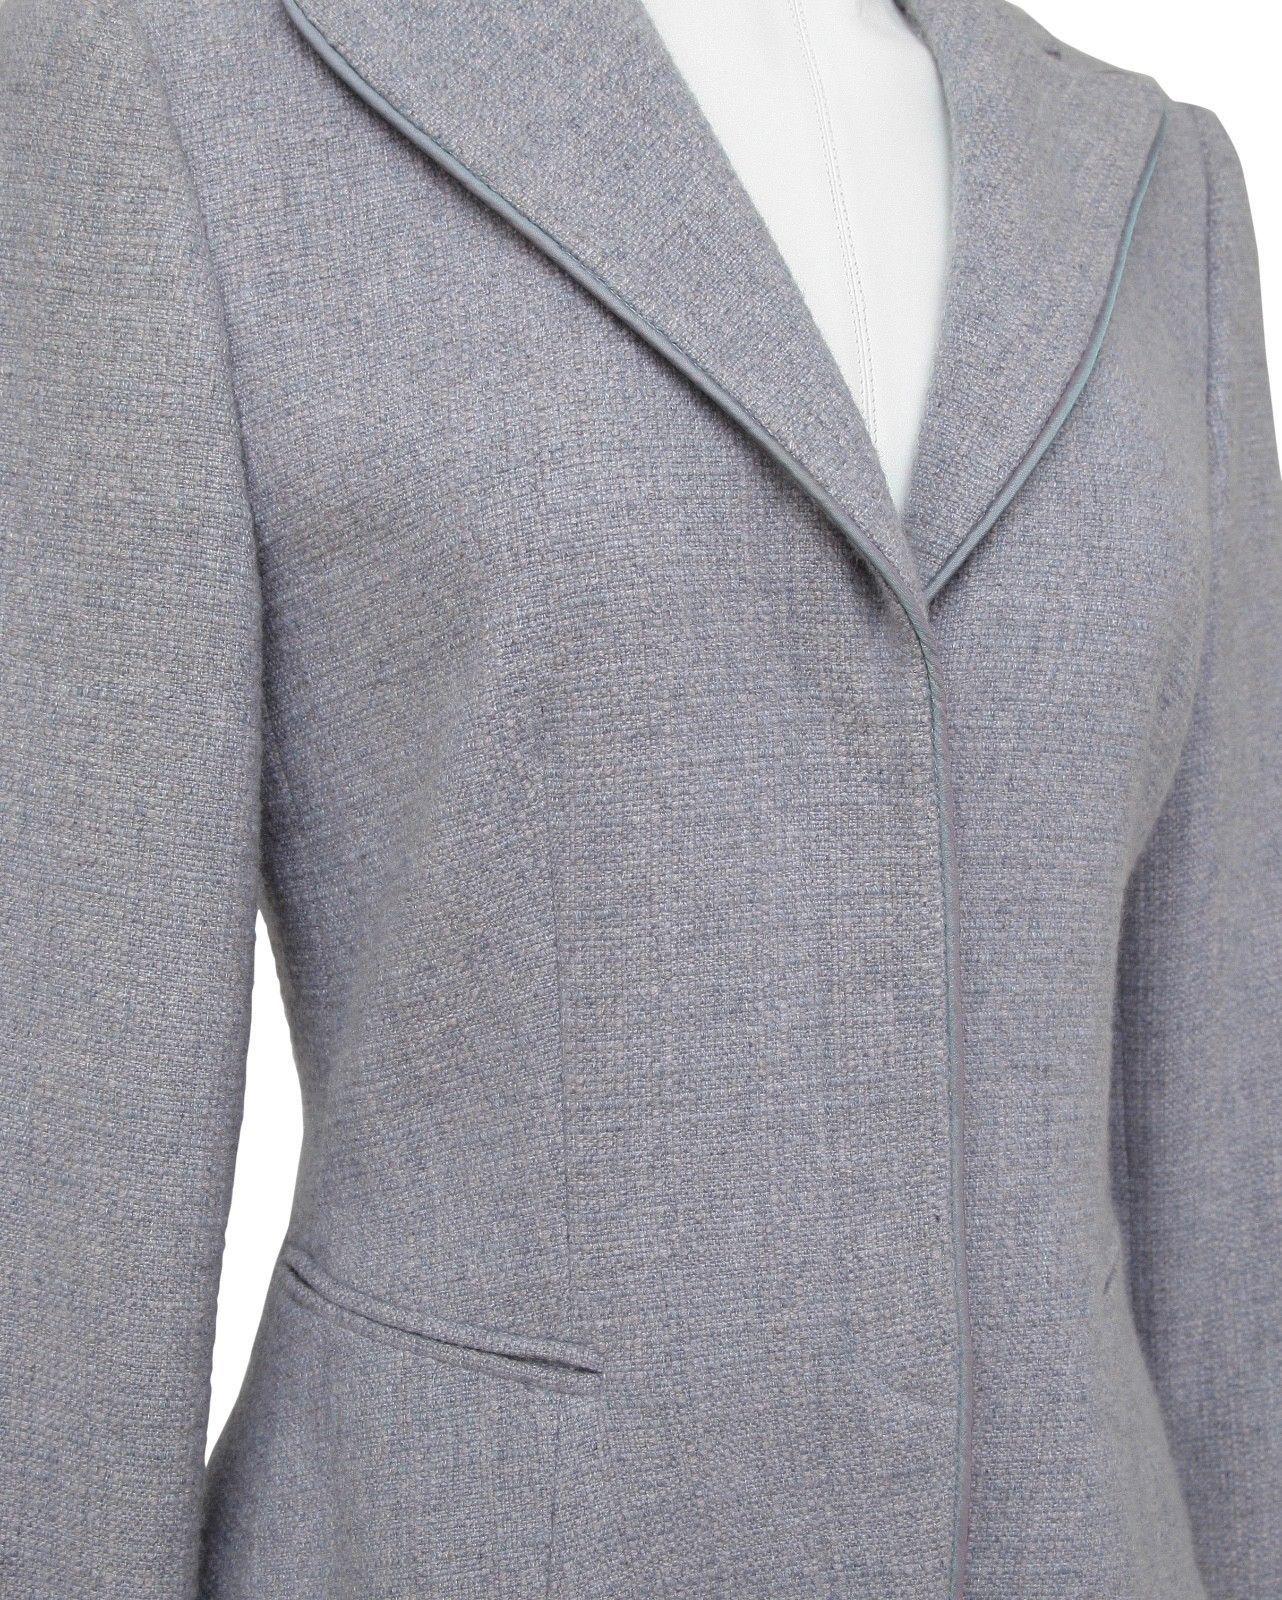 GIORGIO ARMANI Blazer Jacket Lavender Cashmere Classic Dress Sz 38